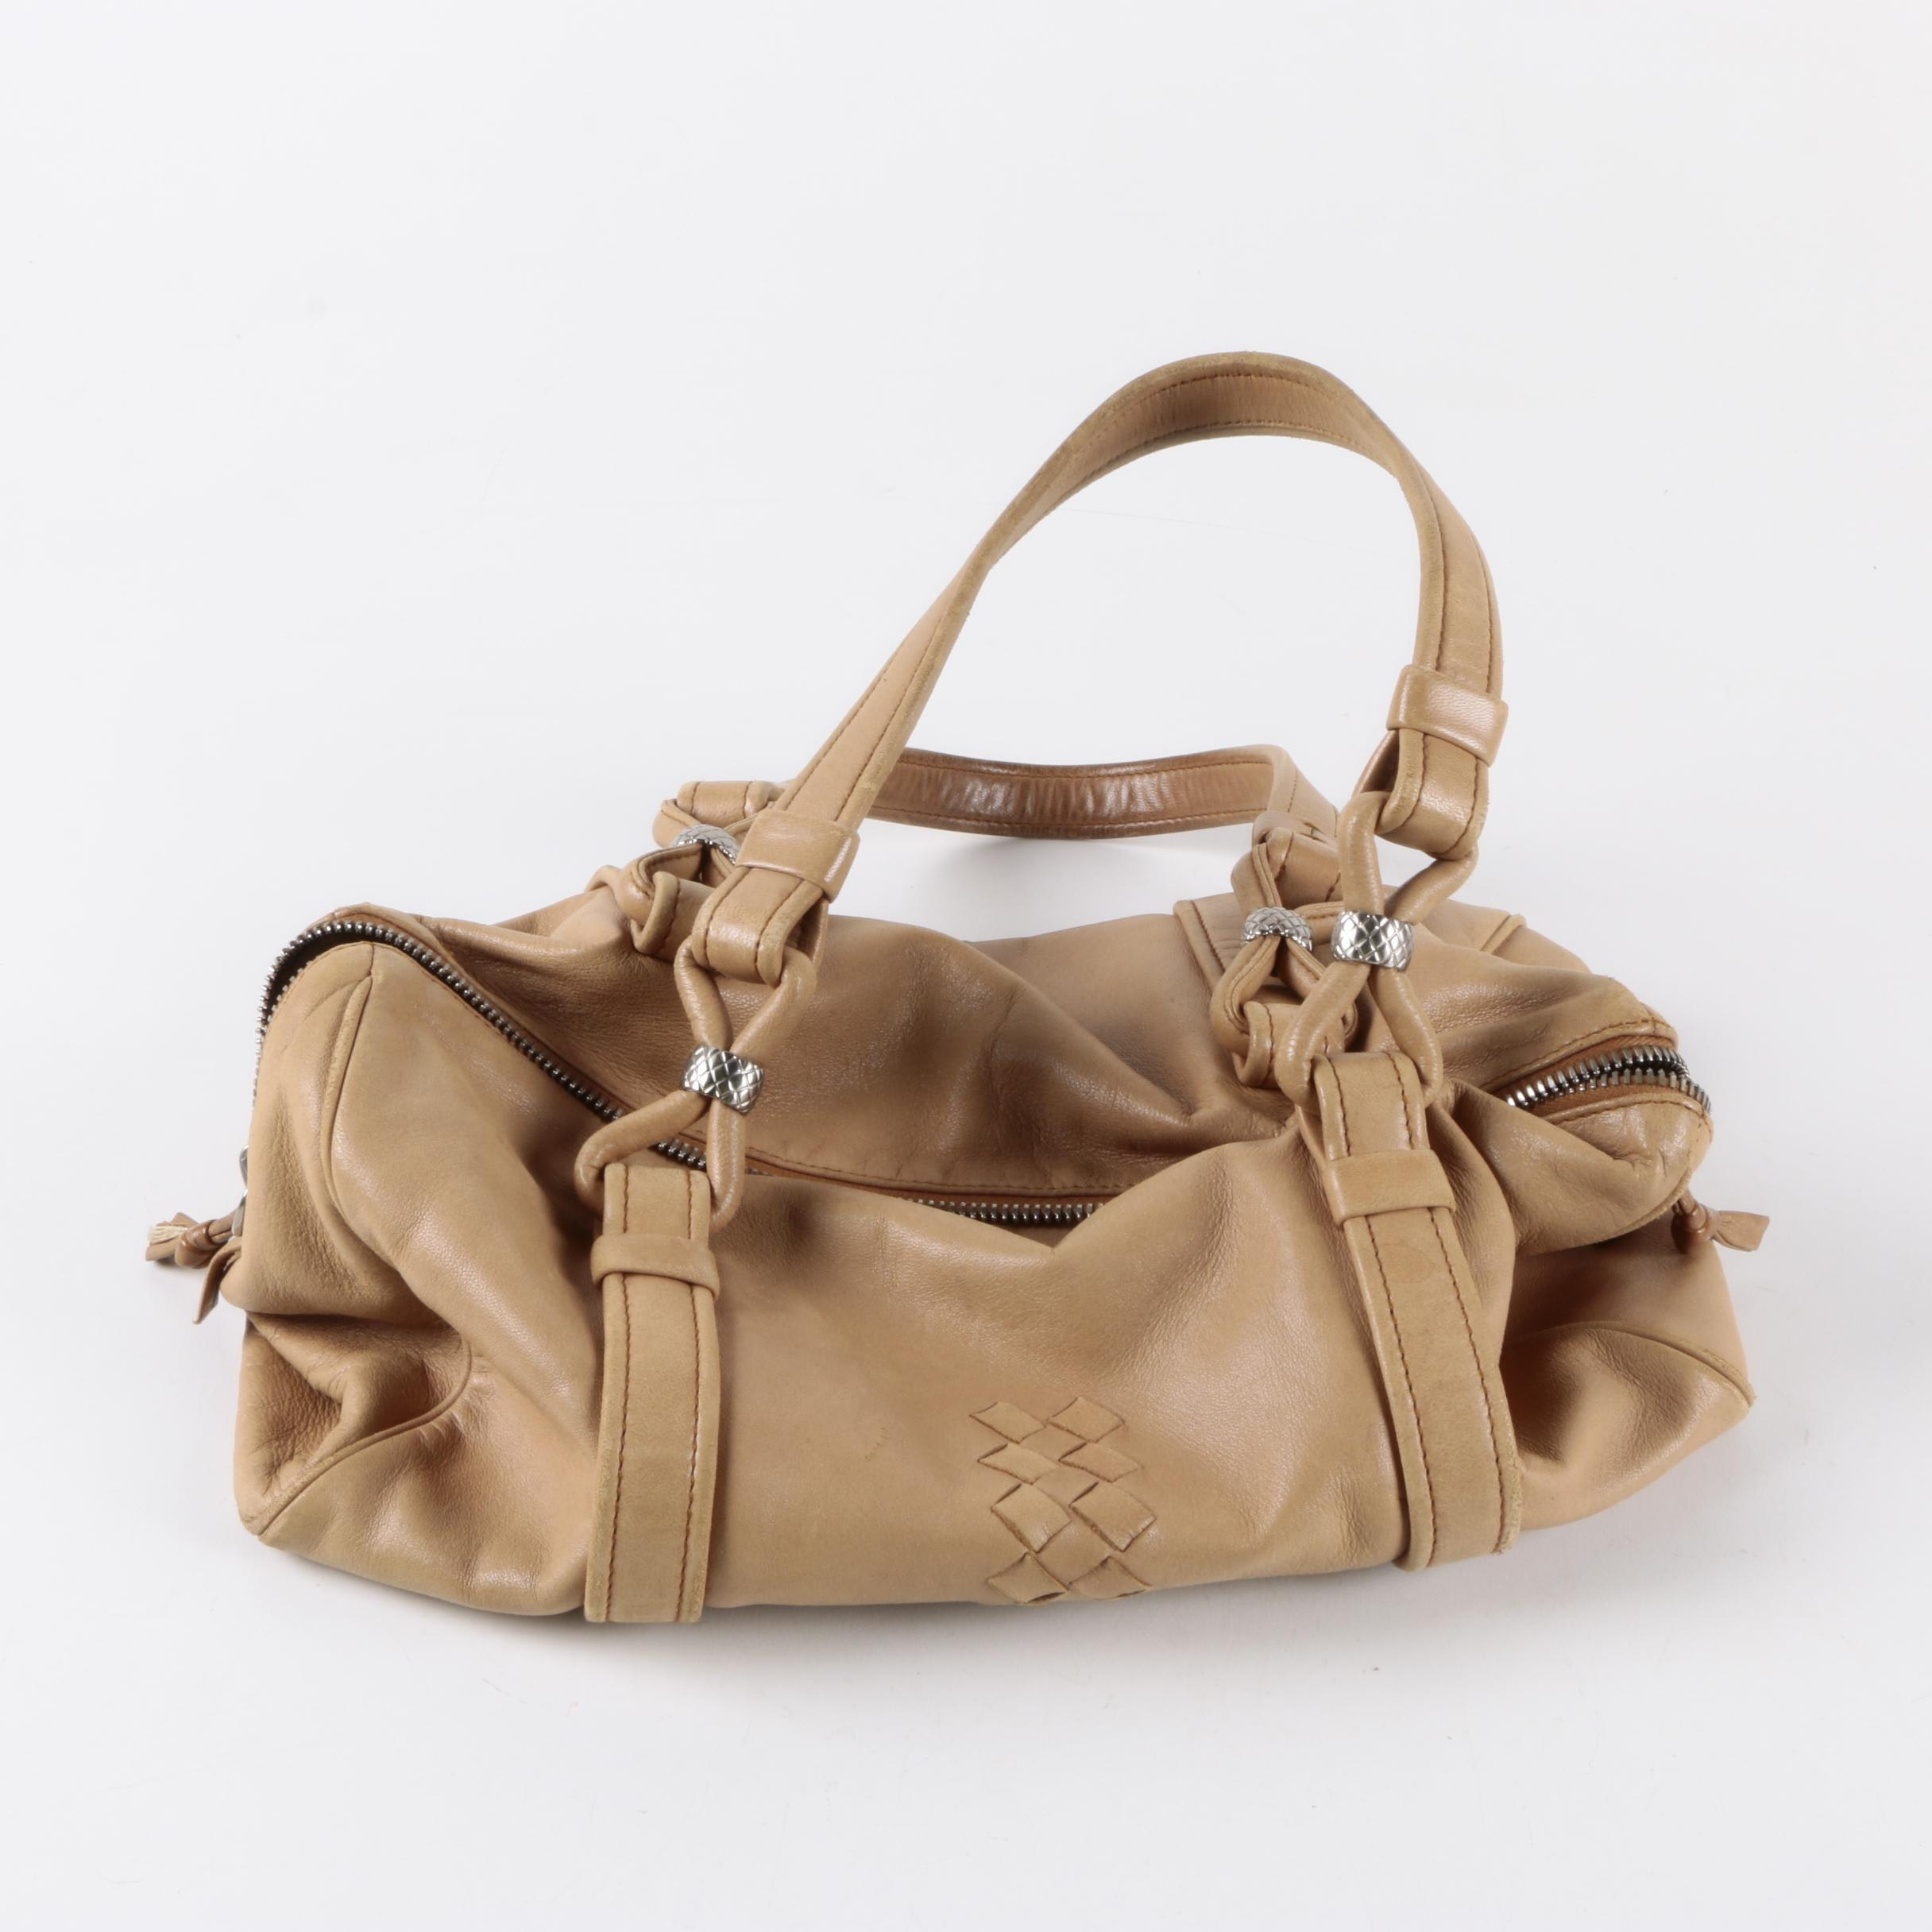 Bottega Veneta Leather Duffel Style Handbag